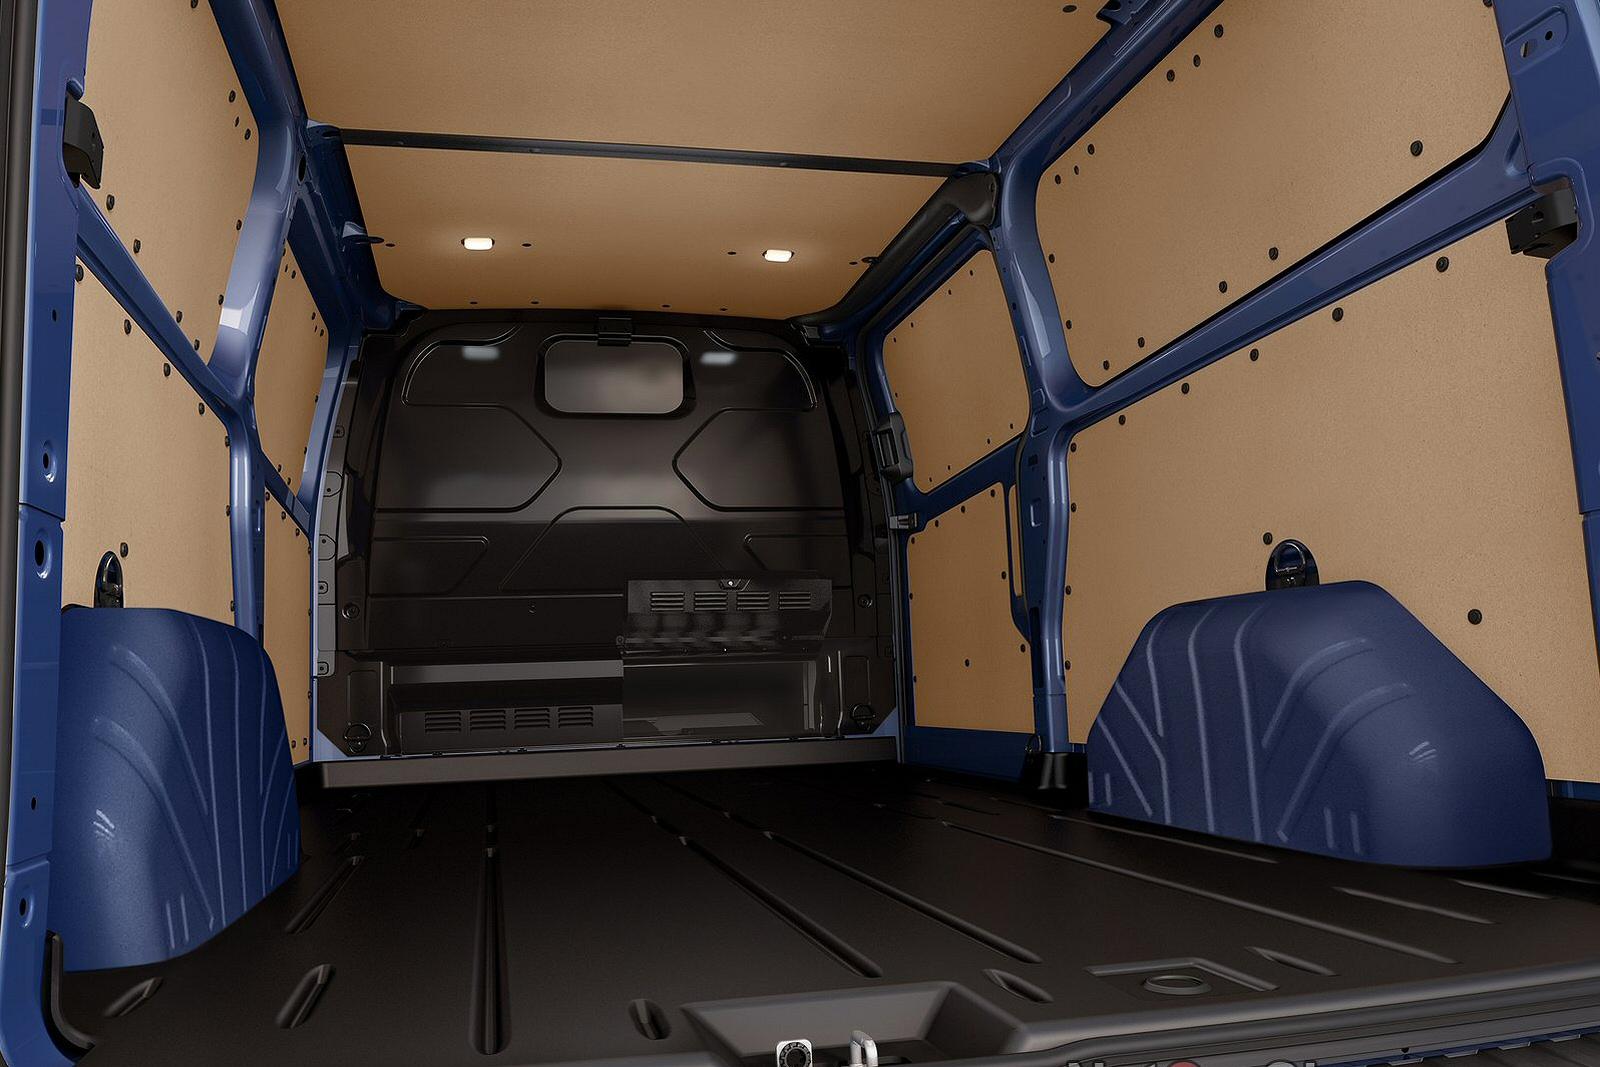 new ford transit custom 270 swb diesel fwd 2 0 tdci 130ps. Black Bedroom Furniture Sets. Home Design Ideas